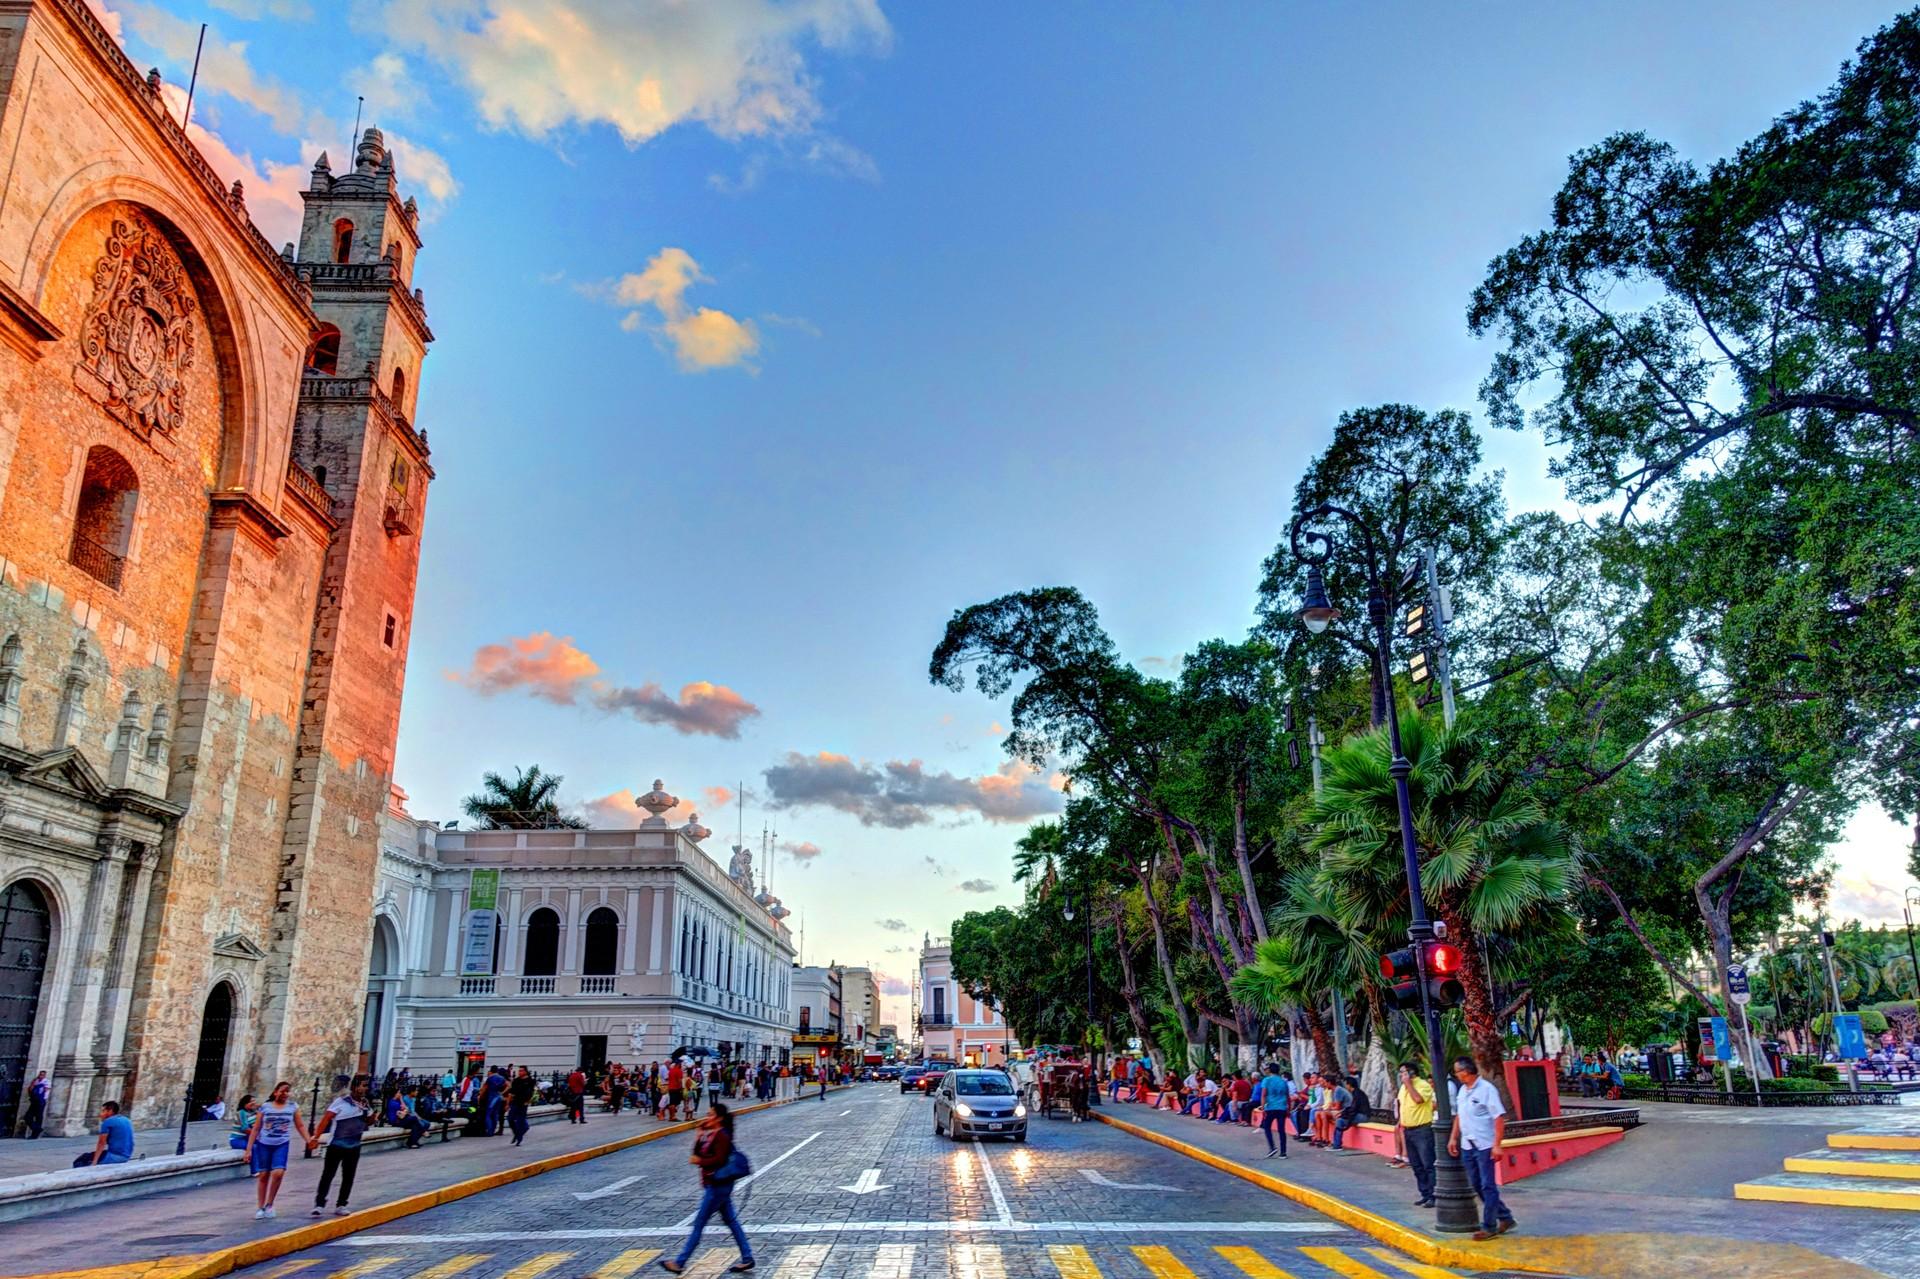 The centre of Mérida in Mexico